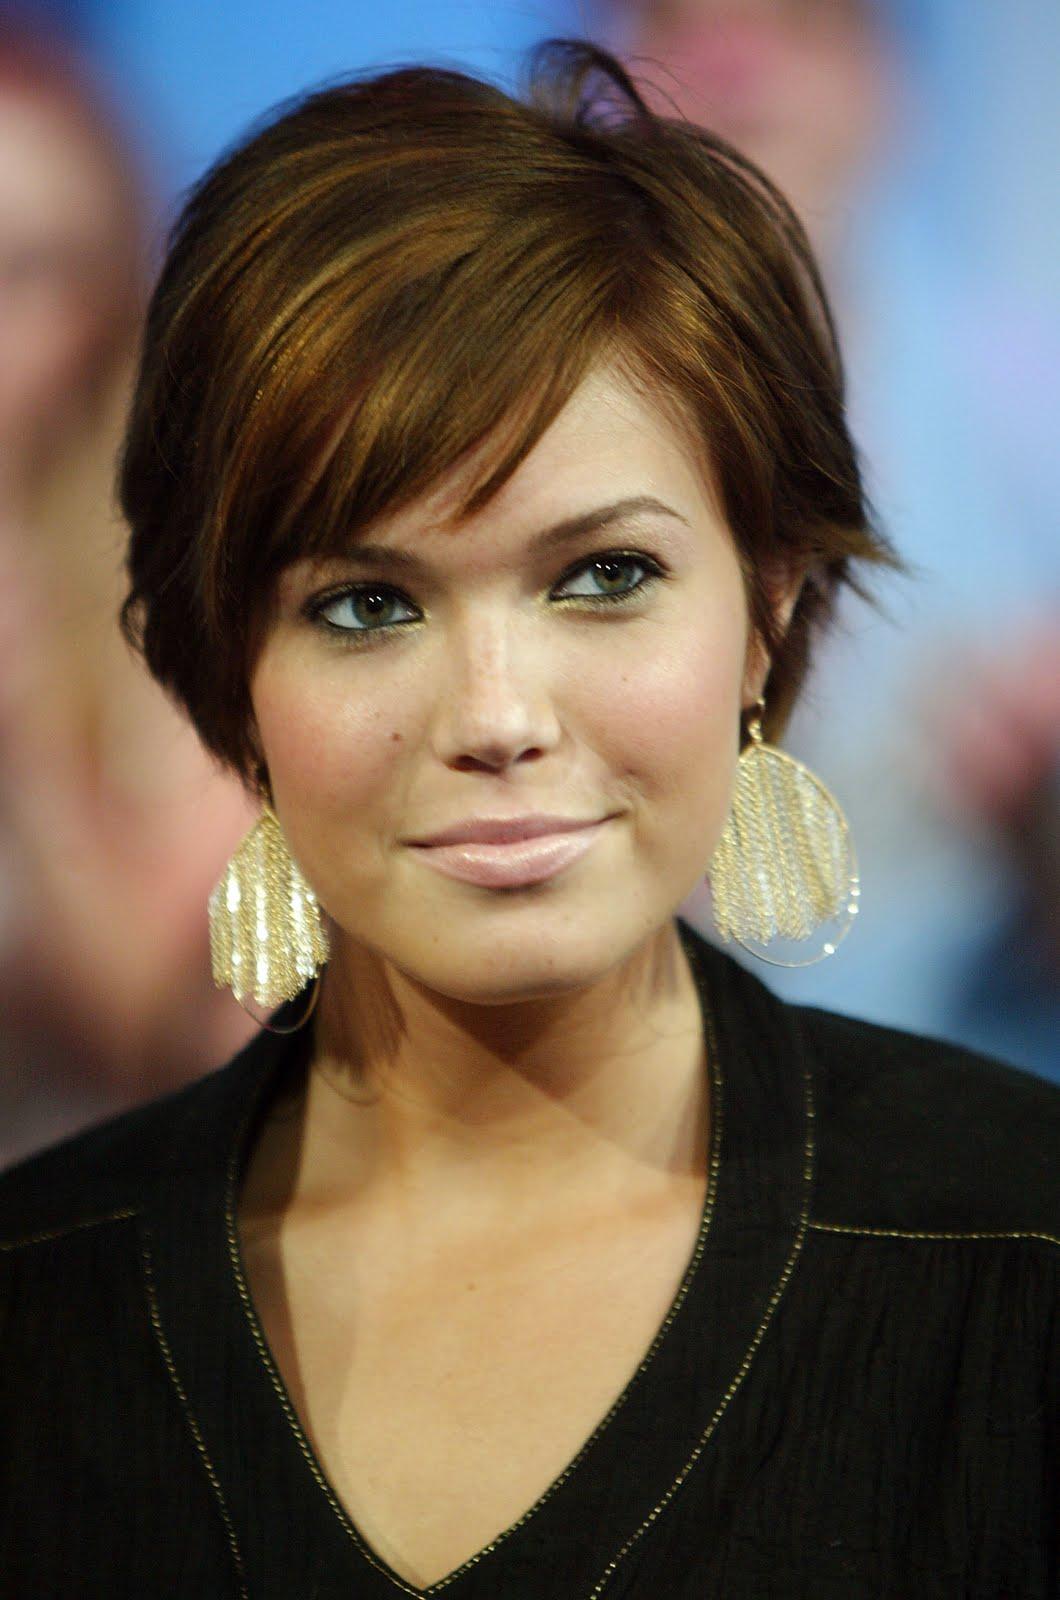 http://2.bp.blogspot.com/-jH89VT_xC_8/TftiXX2Gs4I/AAAAAAAAASI/sF7kexhv580/s1600/Mandy-Moore-Hair-1.jpg